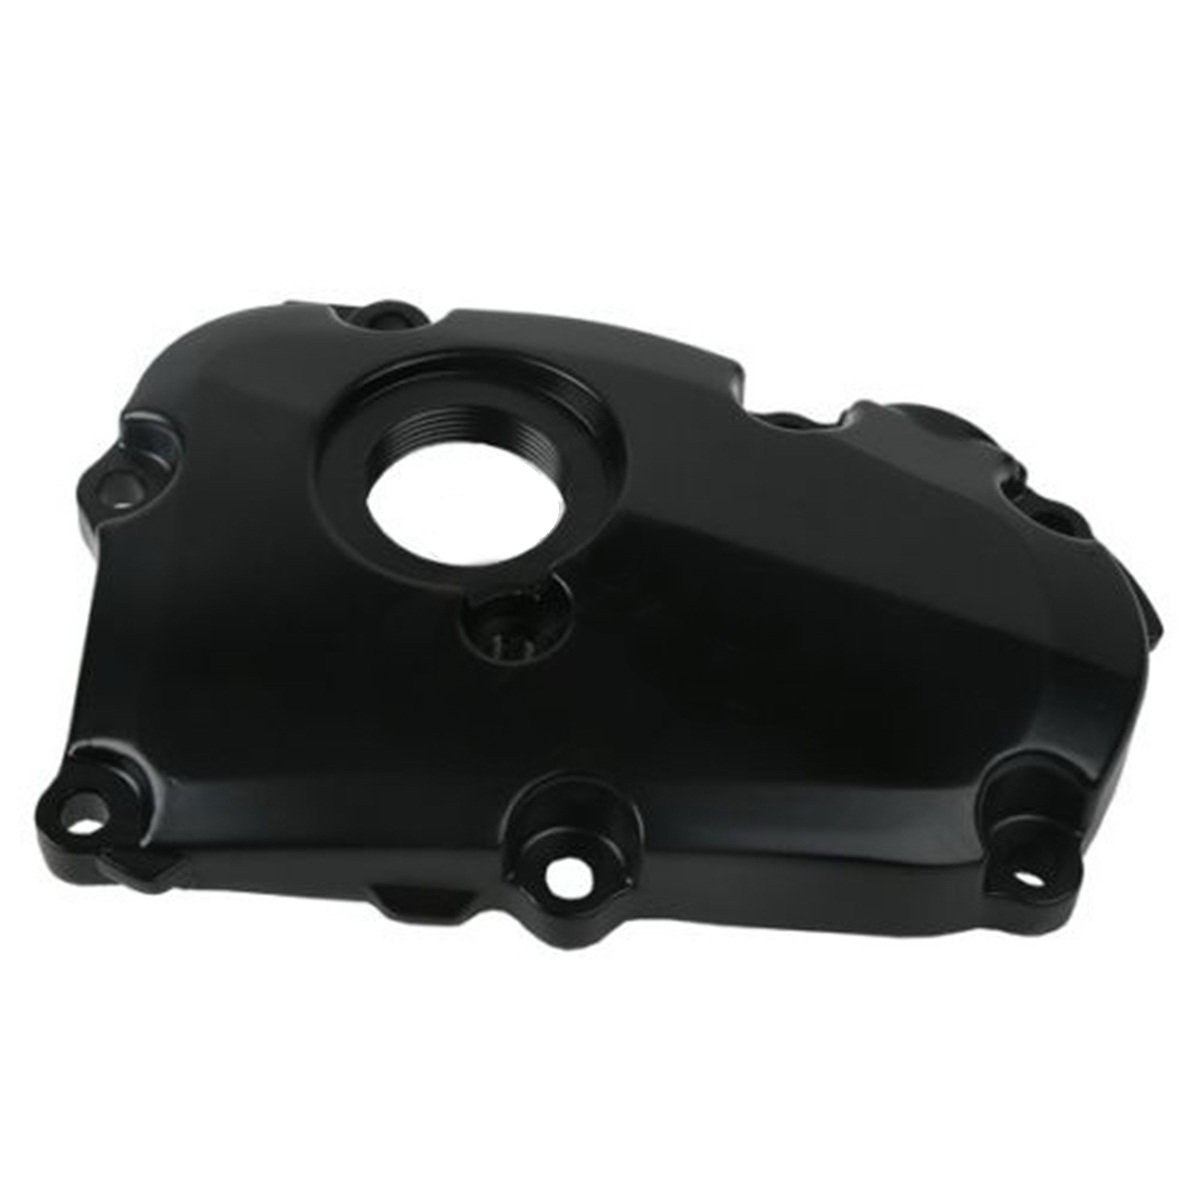 Right Engine Oil Pump Cover Crank Case Crankcase For Yamaha FZ6R FZ 6R 2009-2014